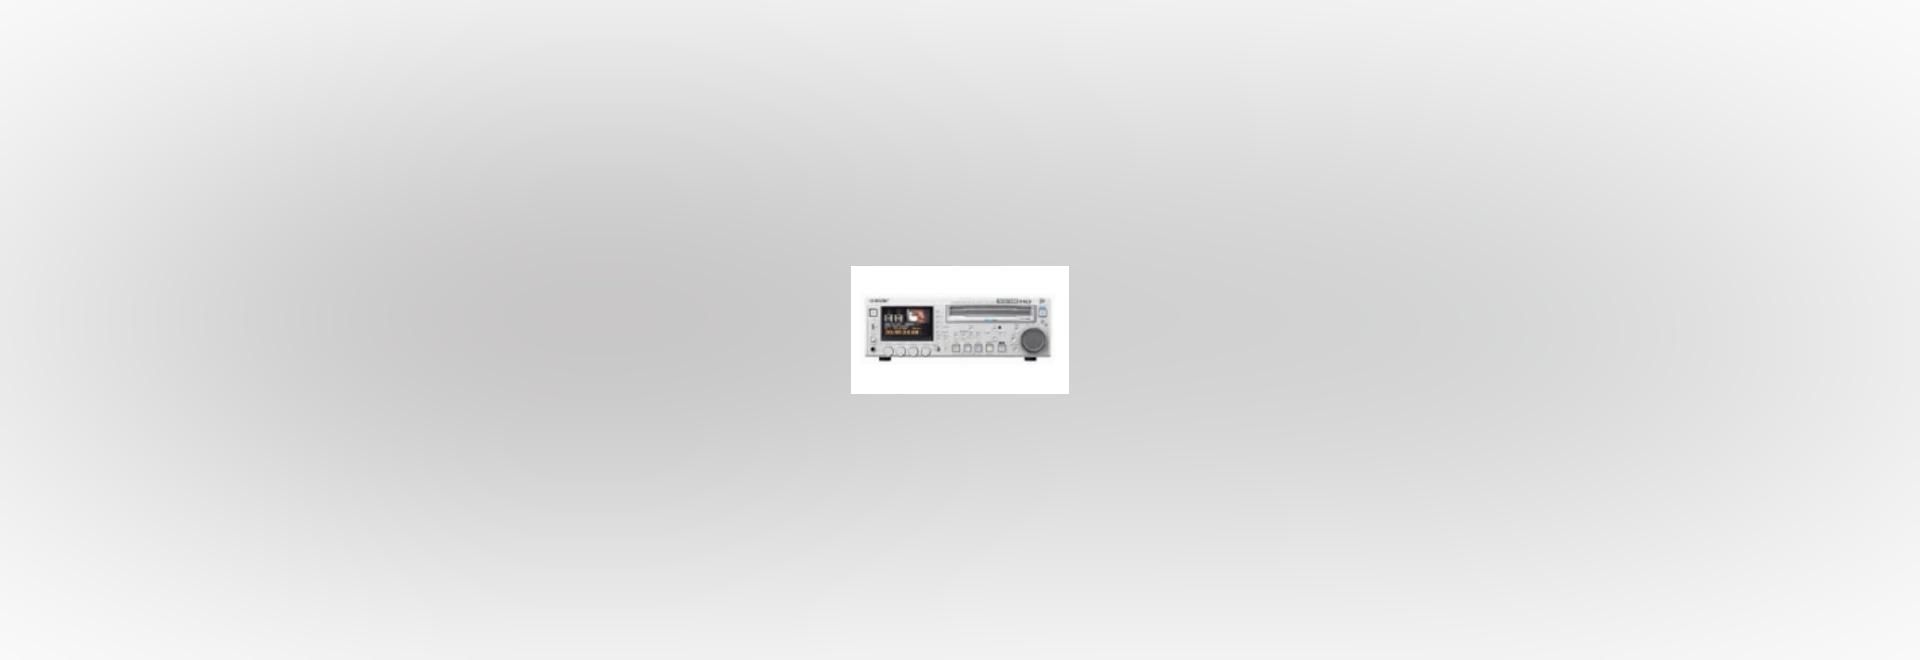 High Definition Medical Recorder Pdw 70md Jays Close Basingstoke